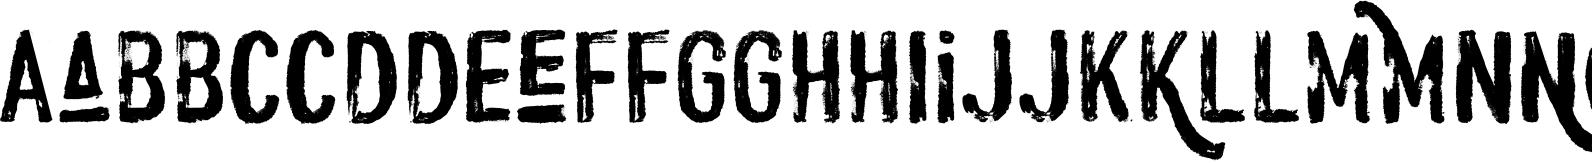 Cherions SVG